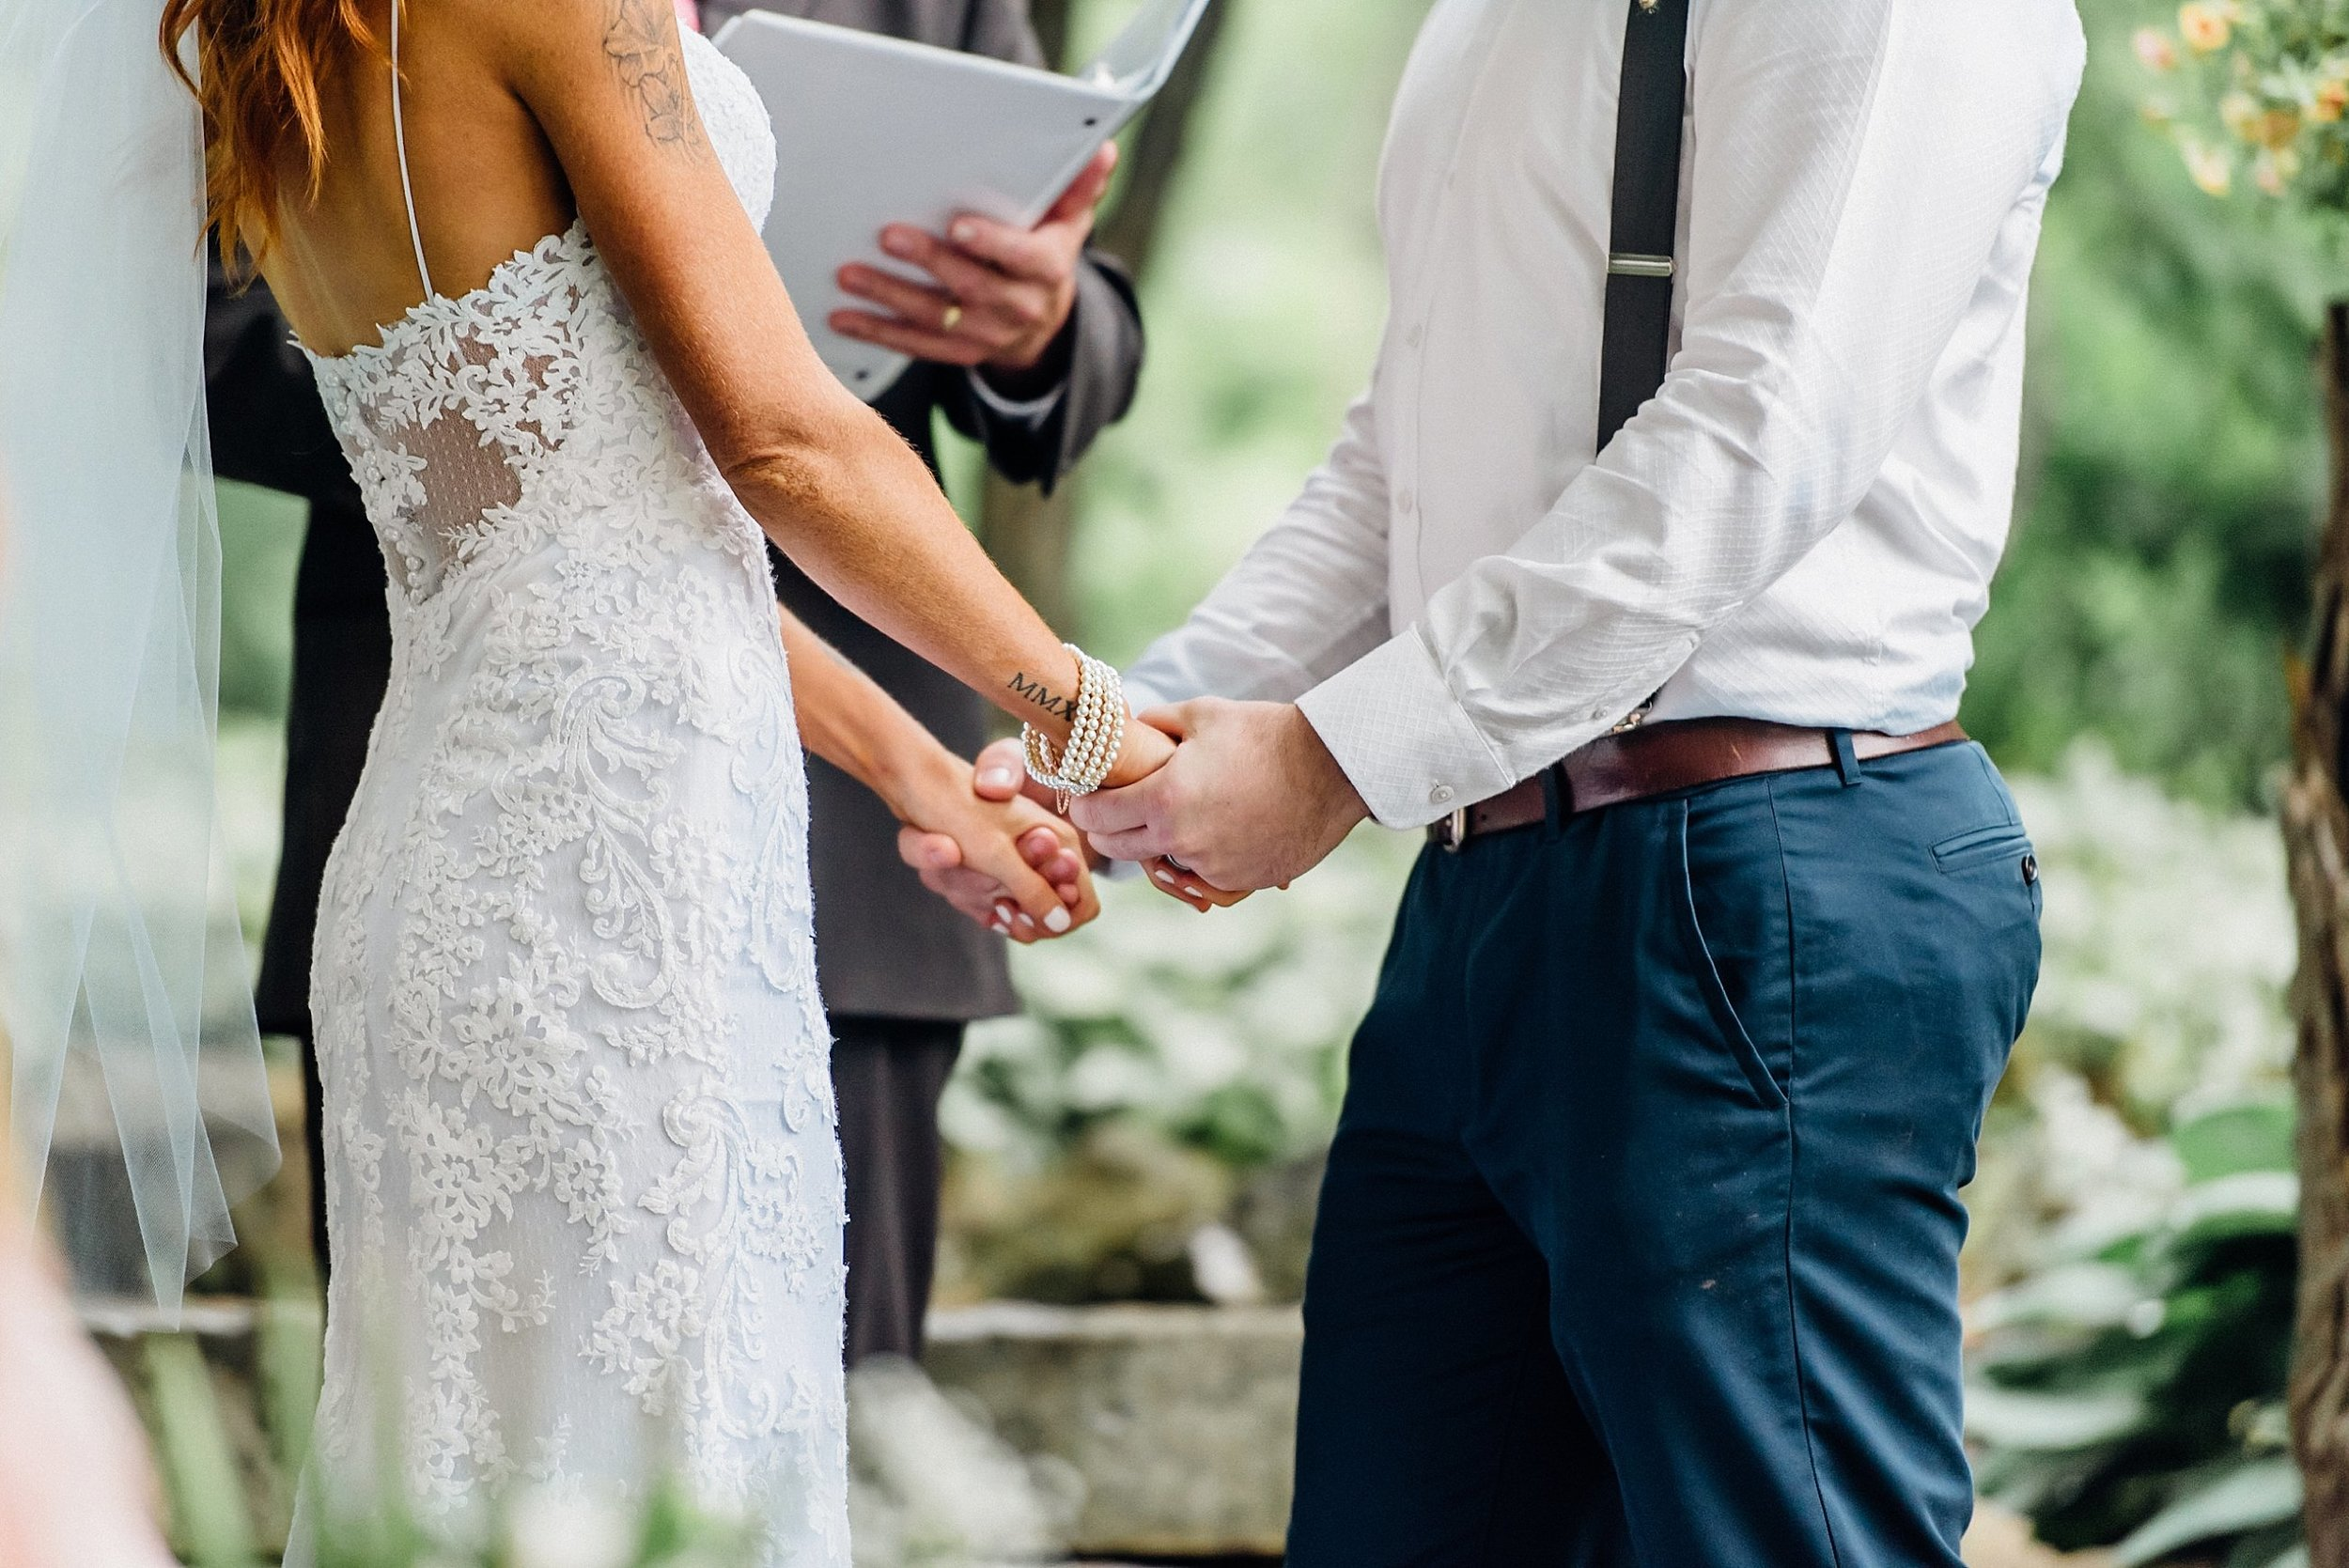 Ottawa Wedding Photographer - Stanley's Olde Maple Lane Barn Wedding - Ali & Batoul Photography_0033.jpg